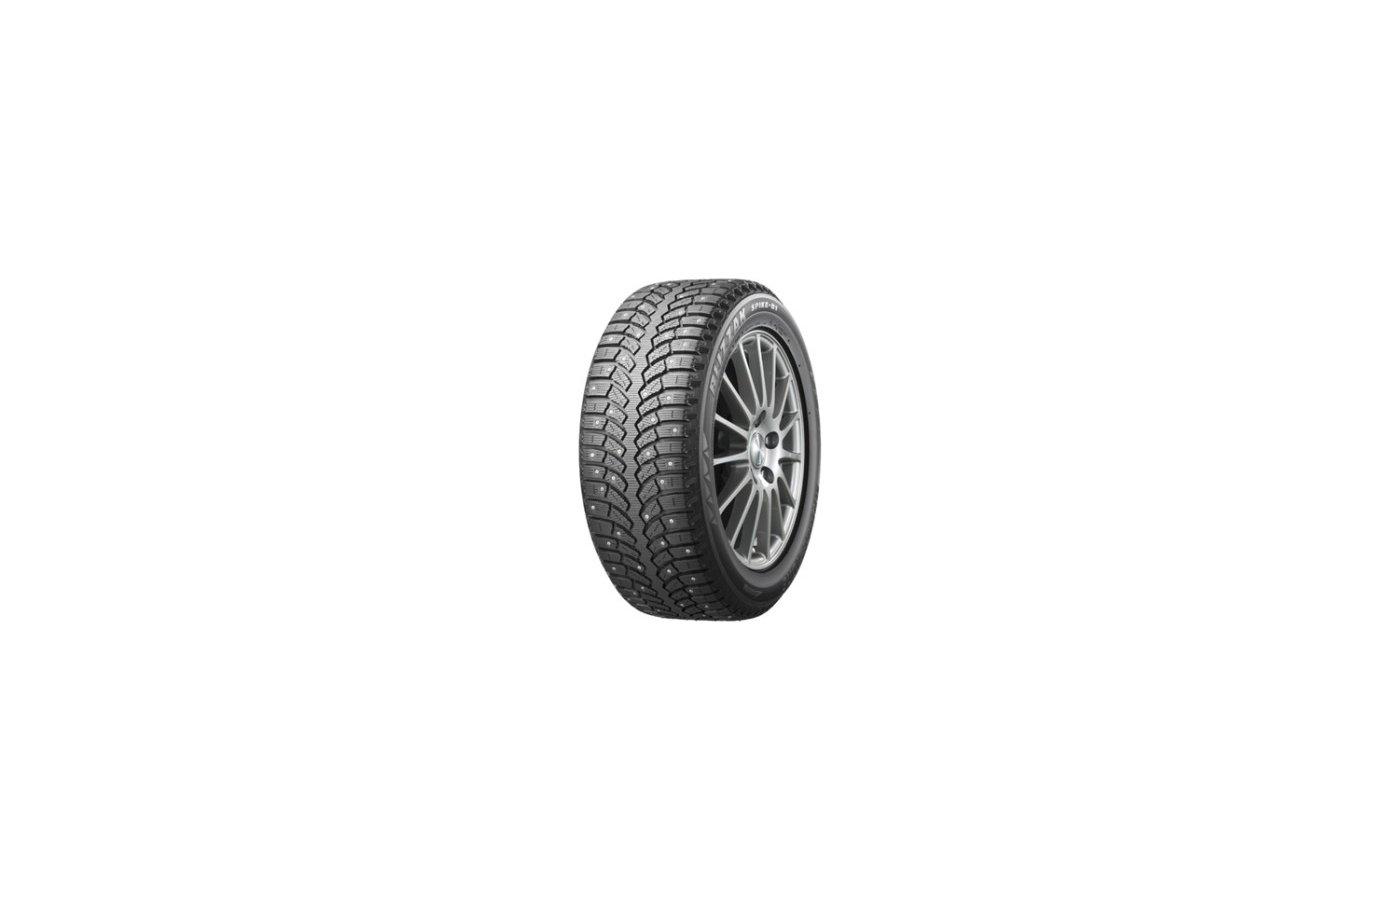 Шина Bridgestone Blizzak Spike-01 185/60 R14 TL 82T шип